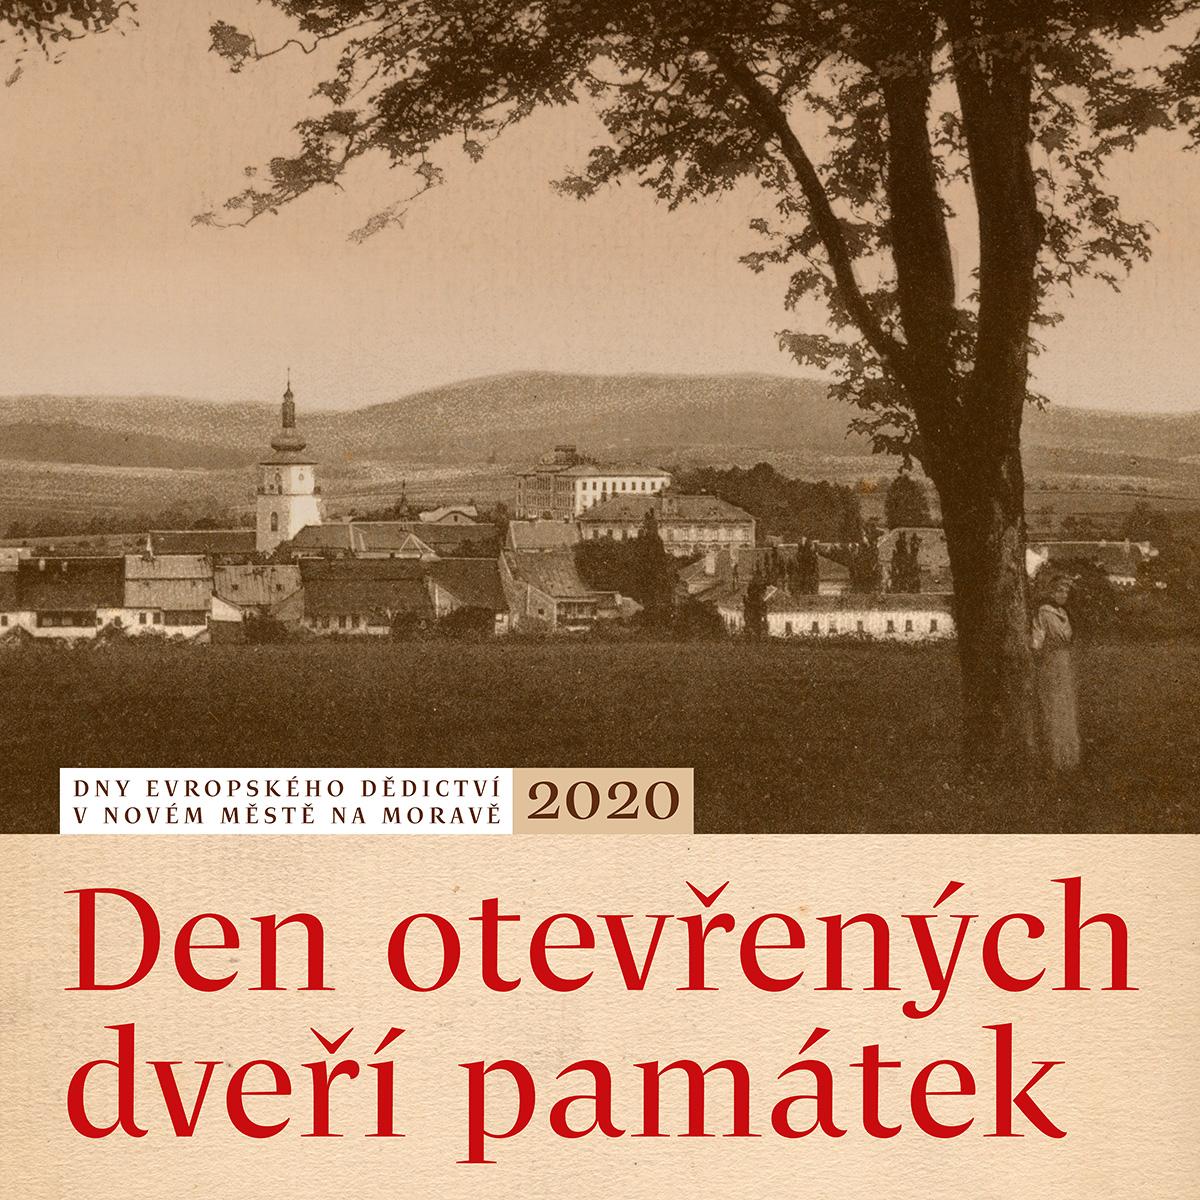 den-otevrenych-dveri-pamatek-2020-web-fb_05_1200x1200px.jpg